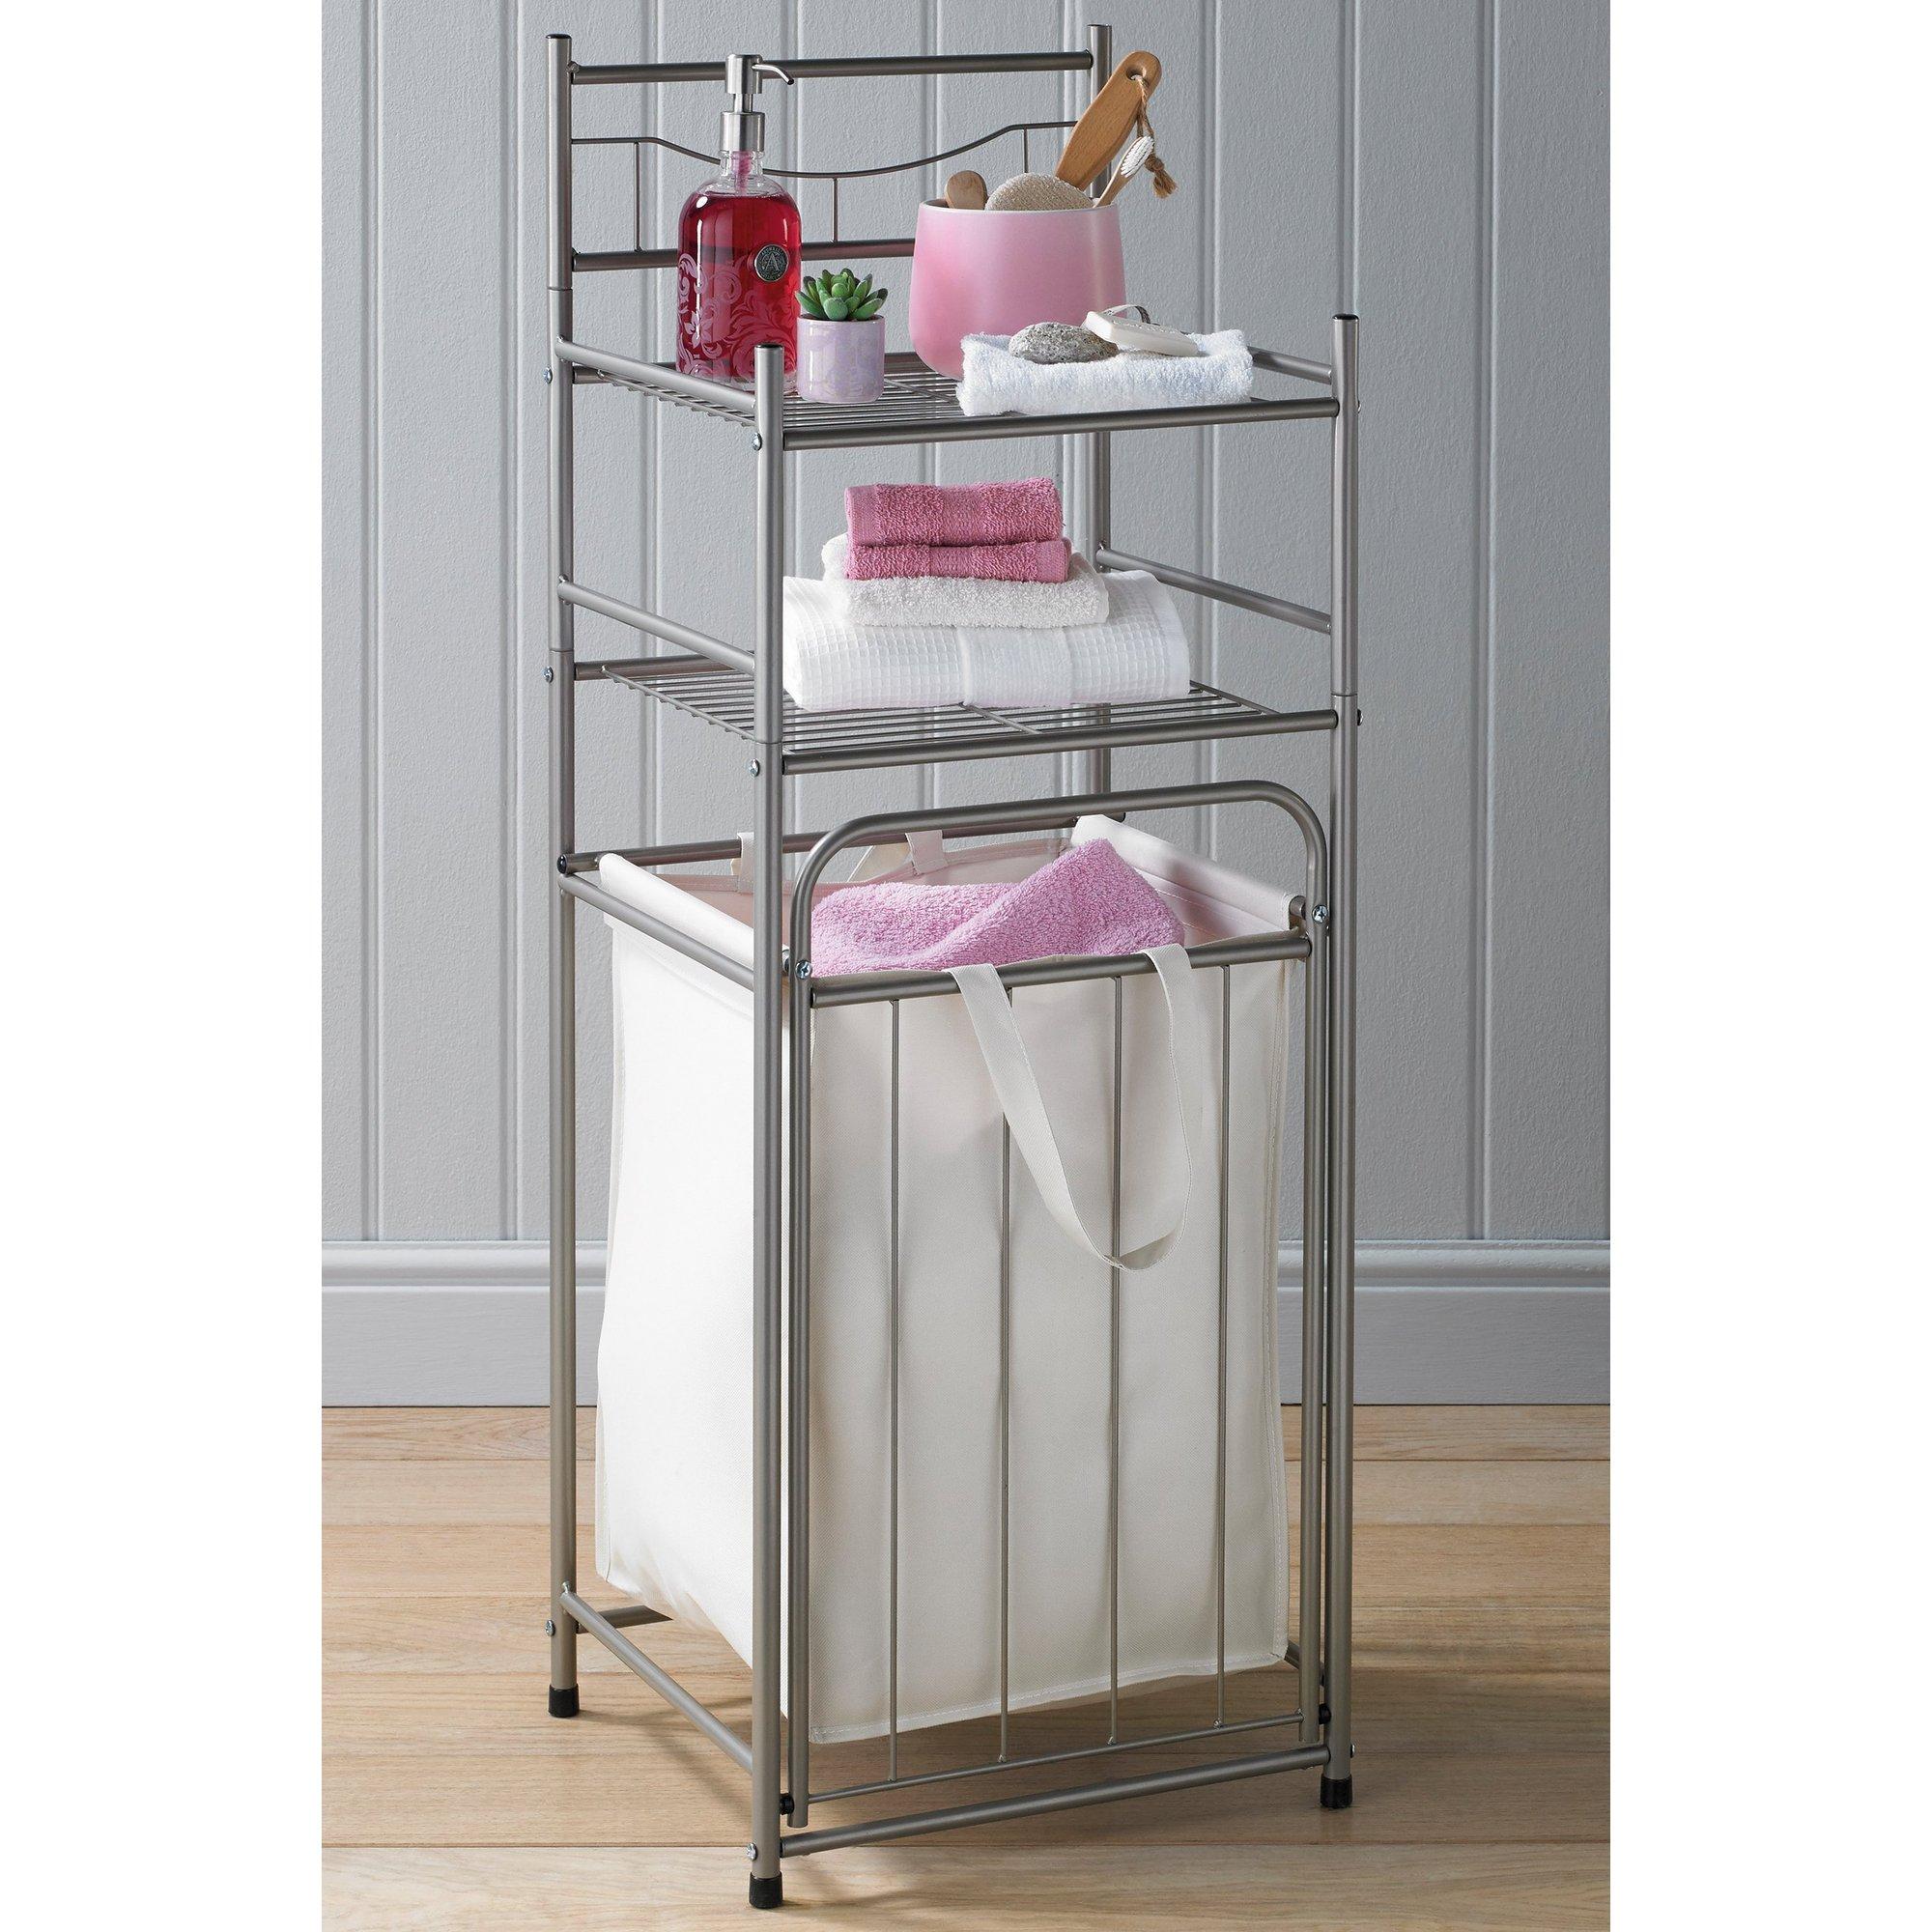 Image of Bathroom Rack with Laundry Hamper